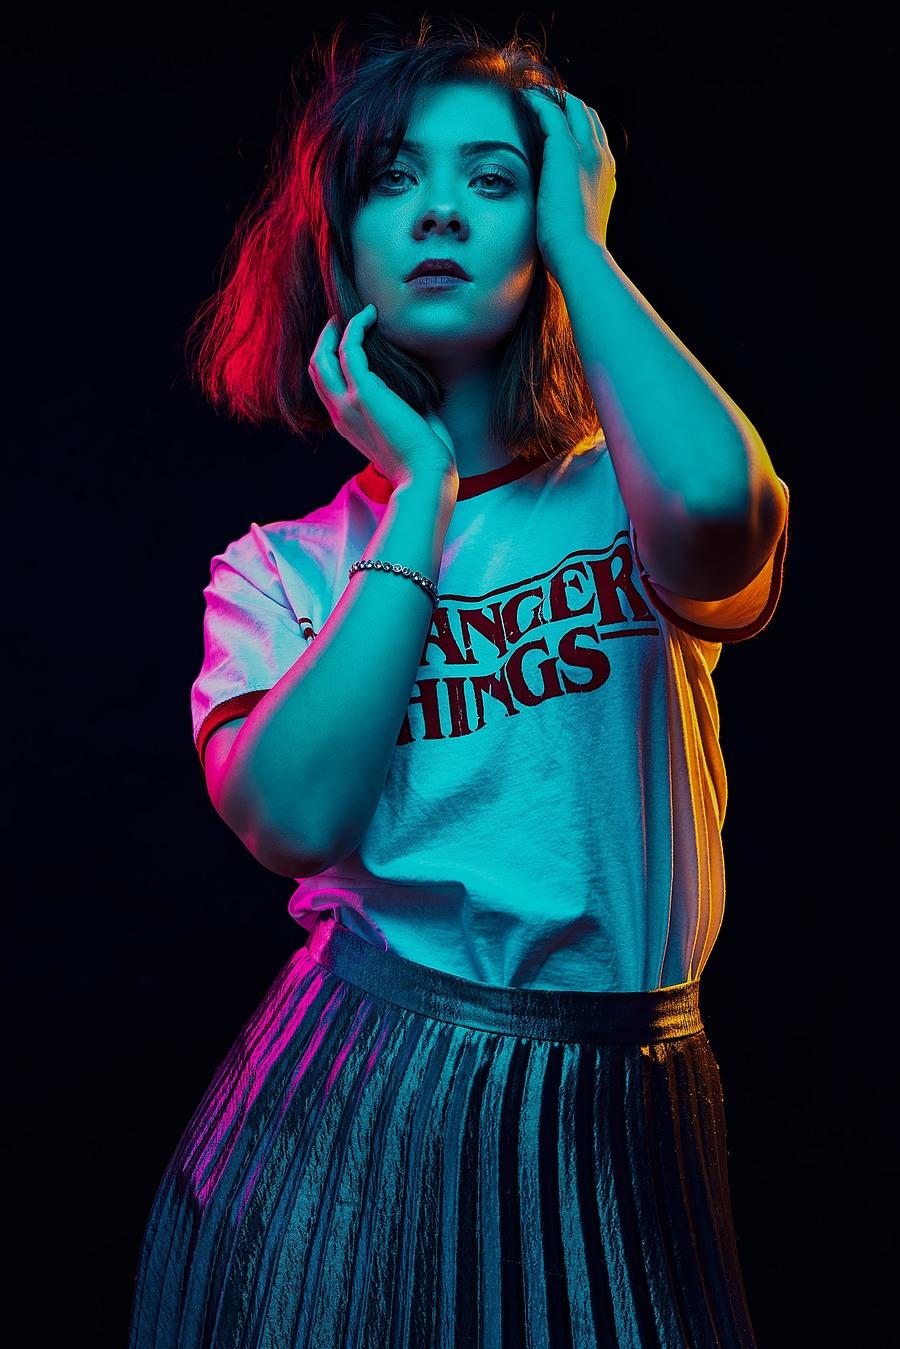 Stranger Things / Photography by David Abbs, Model Brogan Alexandra, Taken at Studio 33 / Uploaded 1st October 2018 @ 08:50 PM